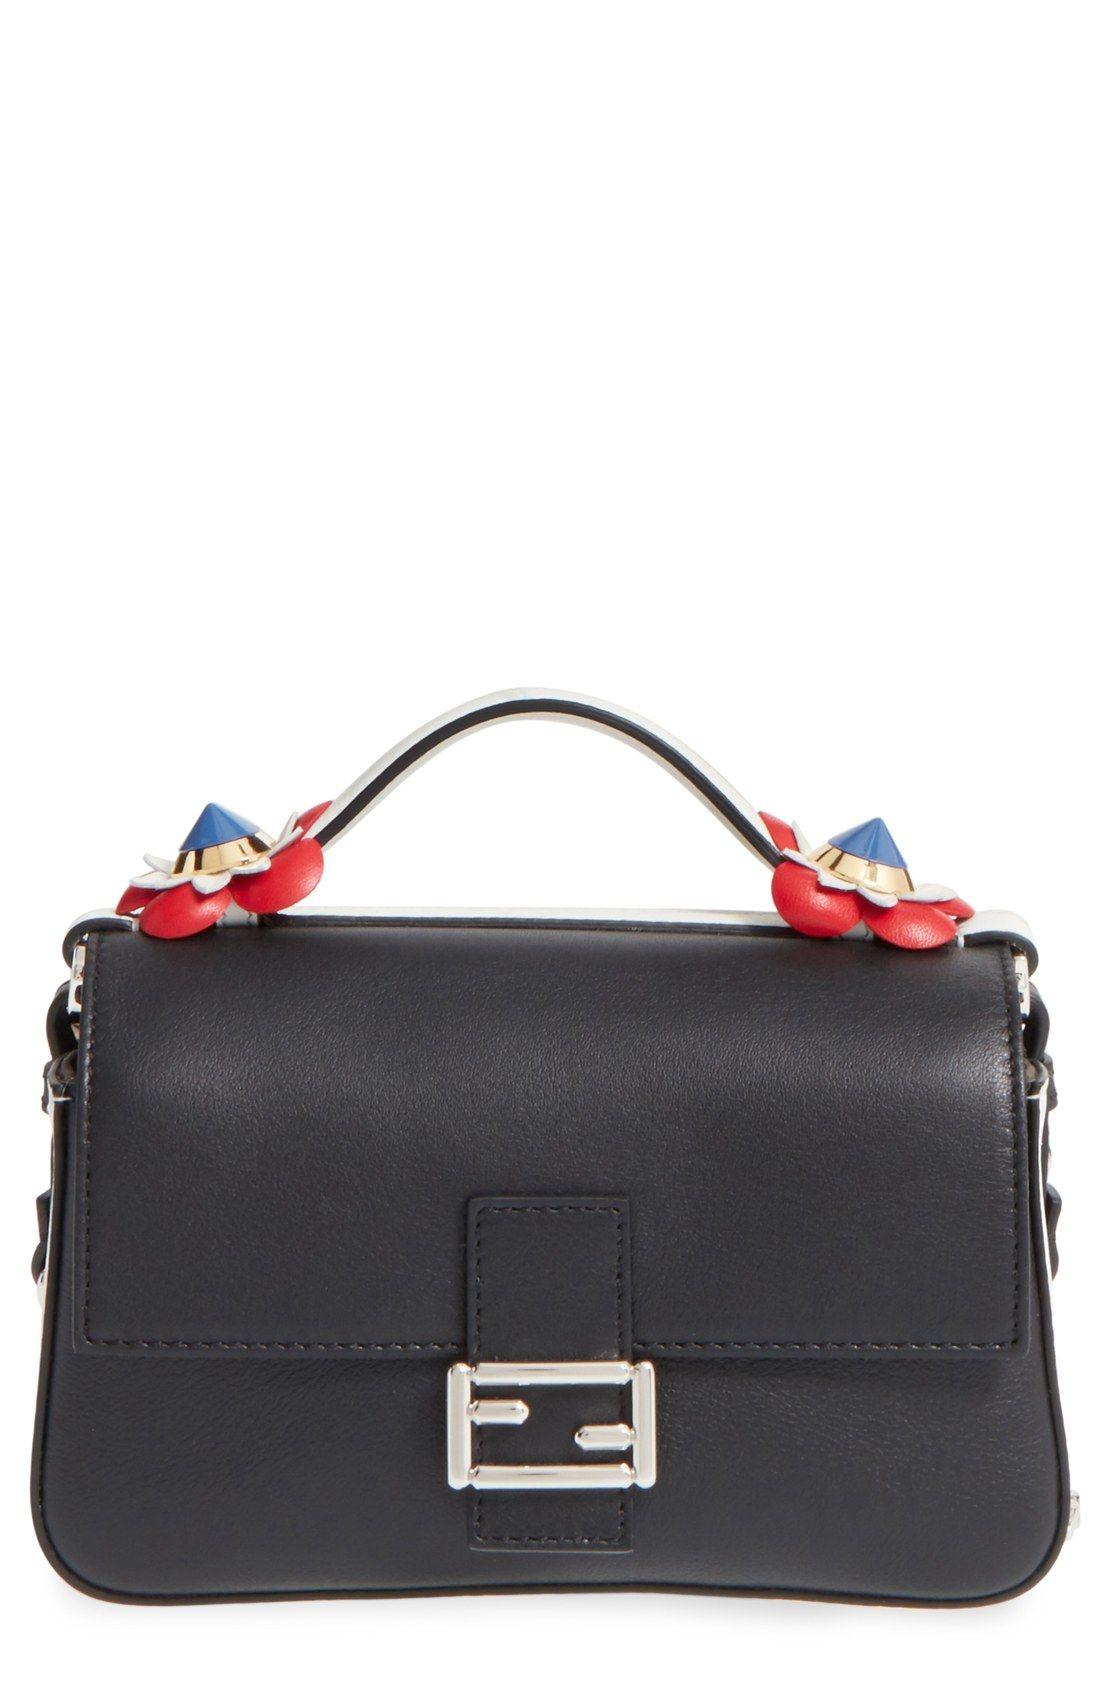 Fendi 'Double Micro' Leather Baguette